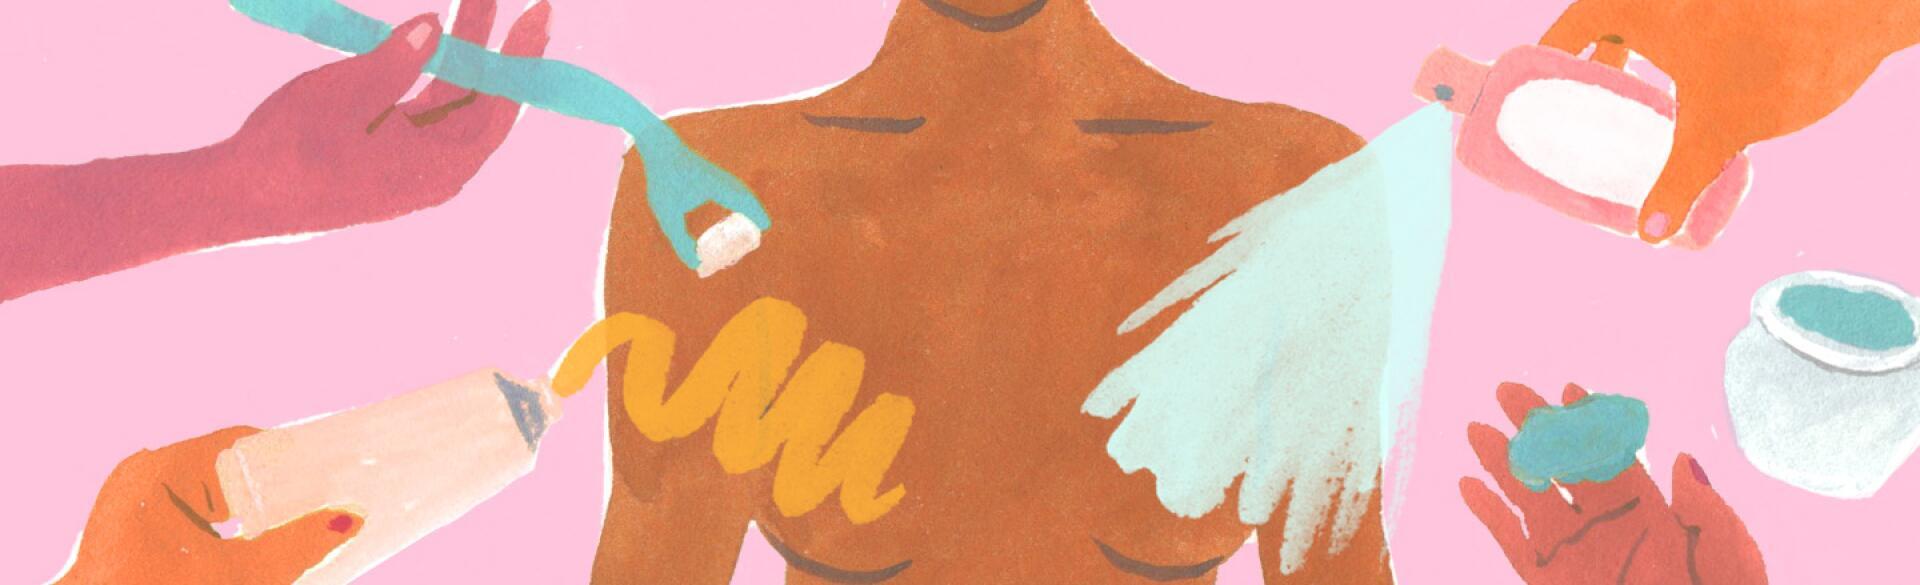 Illustration of non invasive treatments for breast facials.